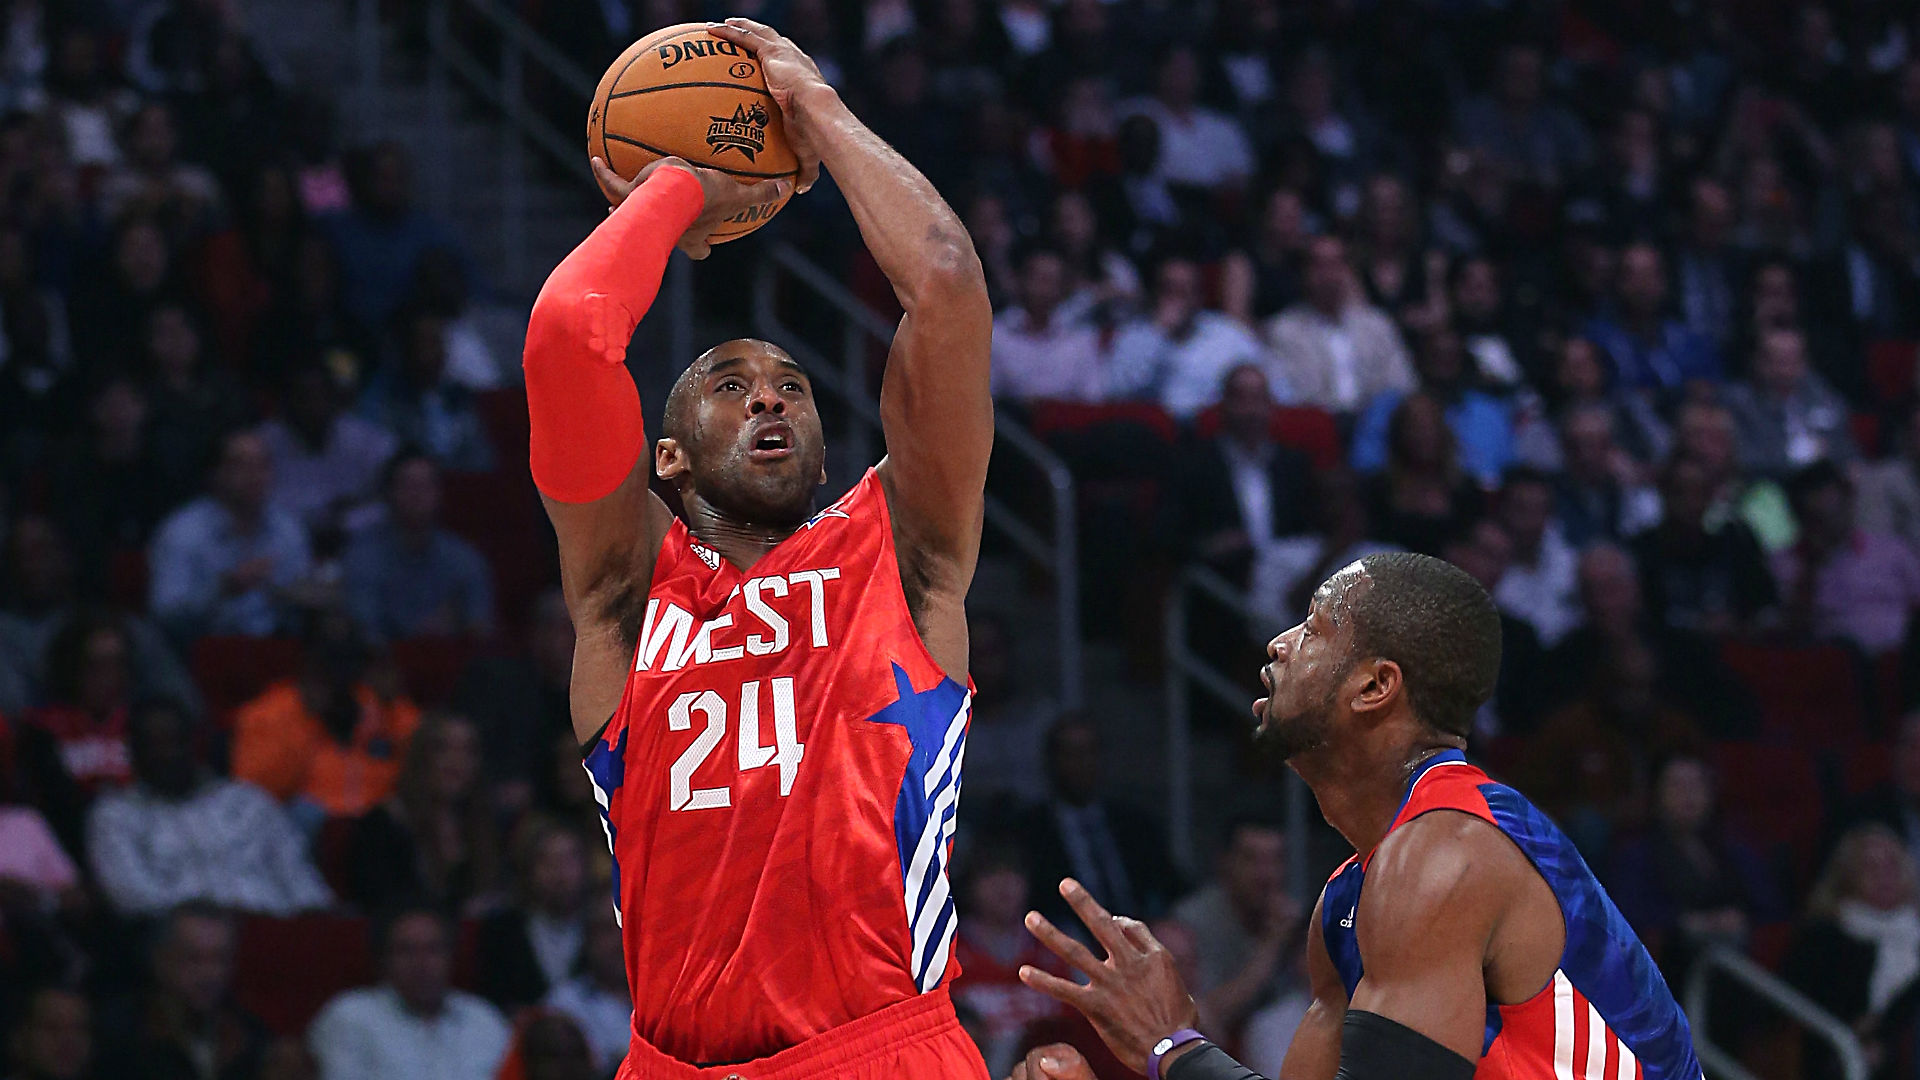 Kobe Bryant all star game-21216-getty-ftr.jpg